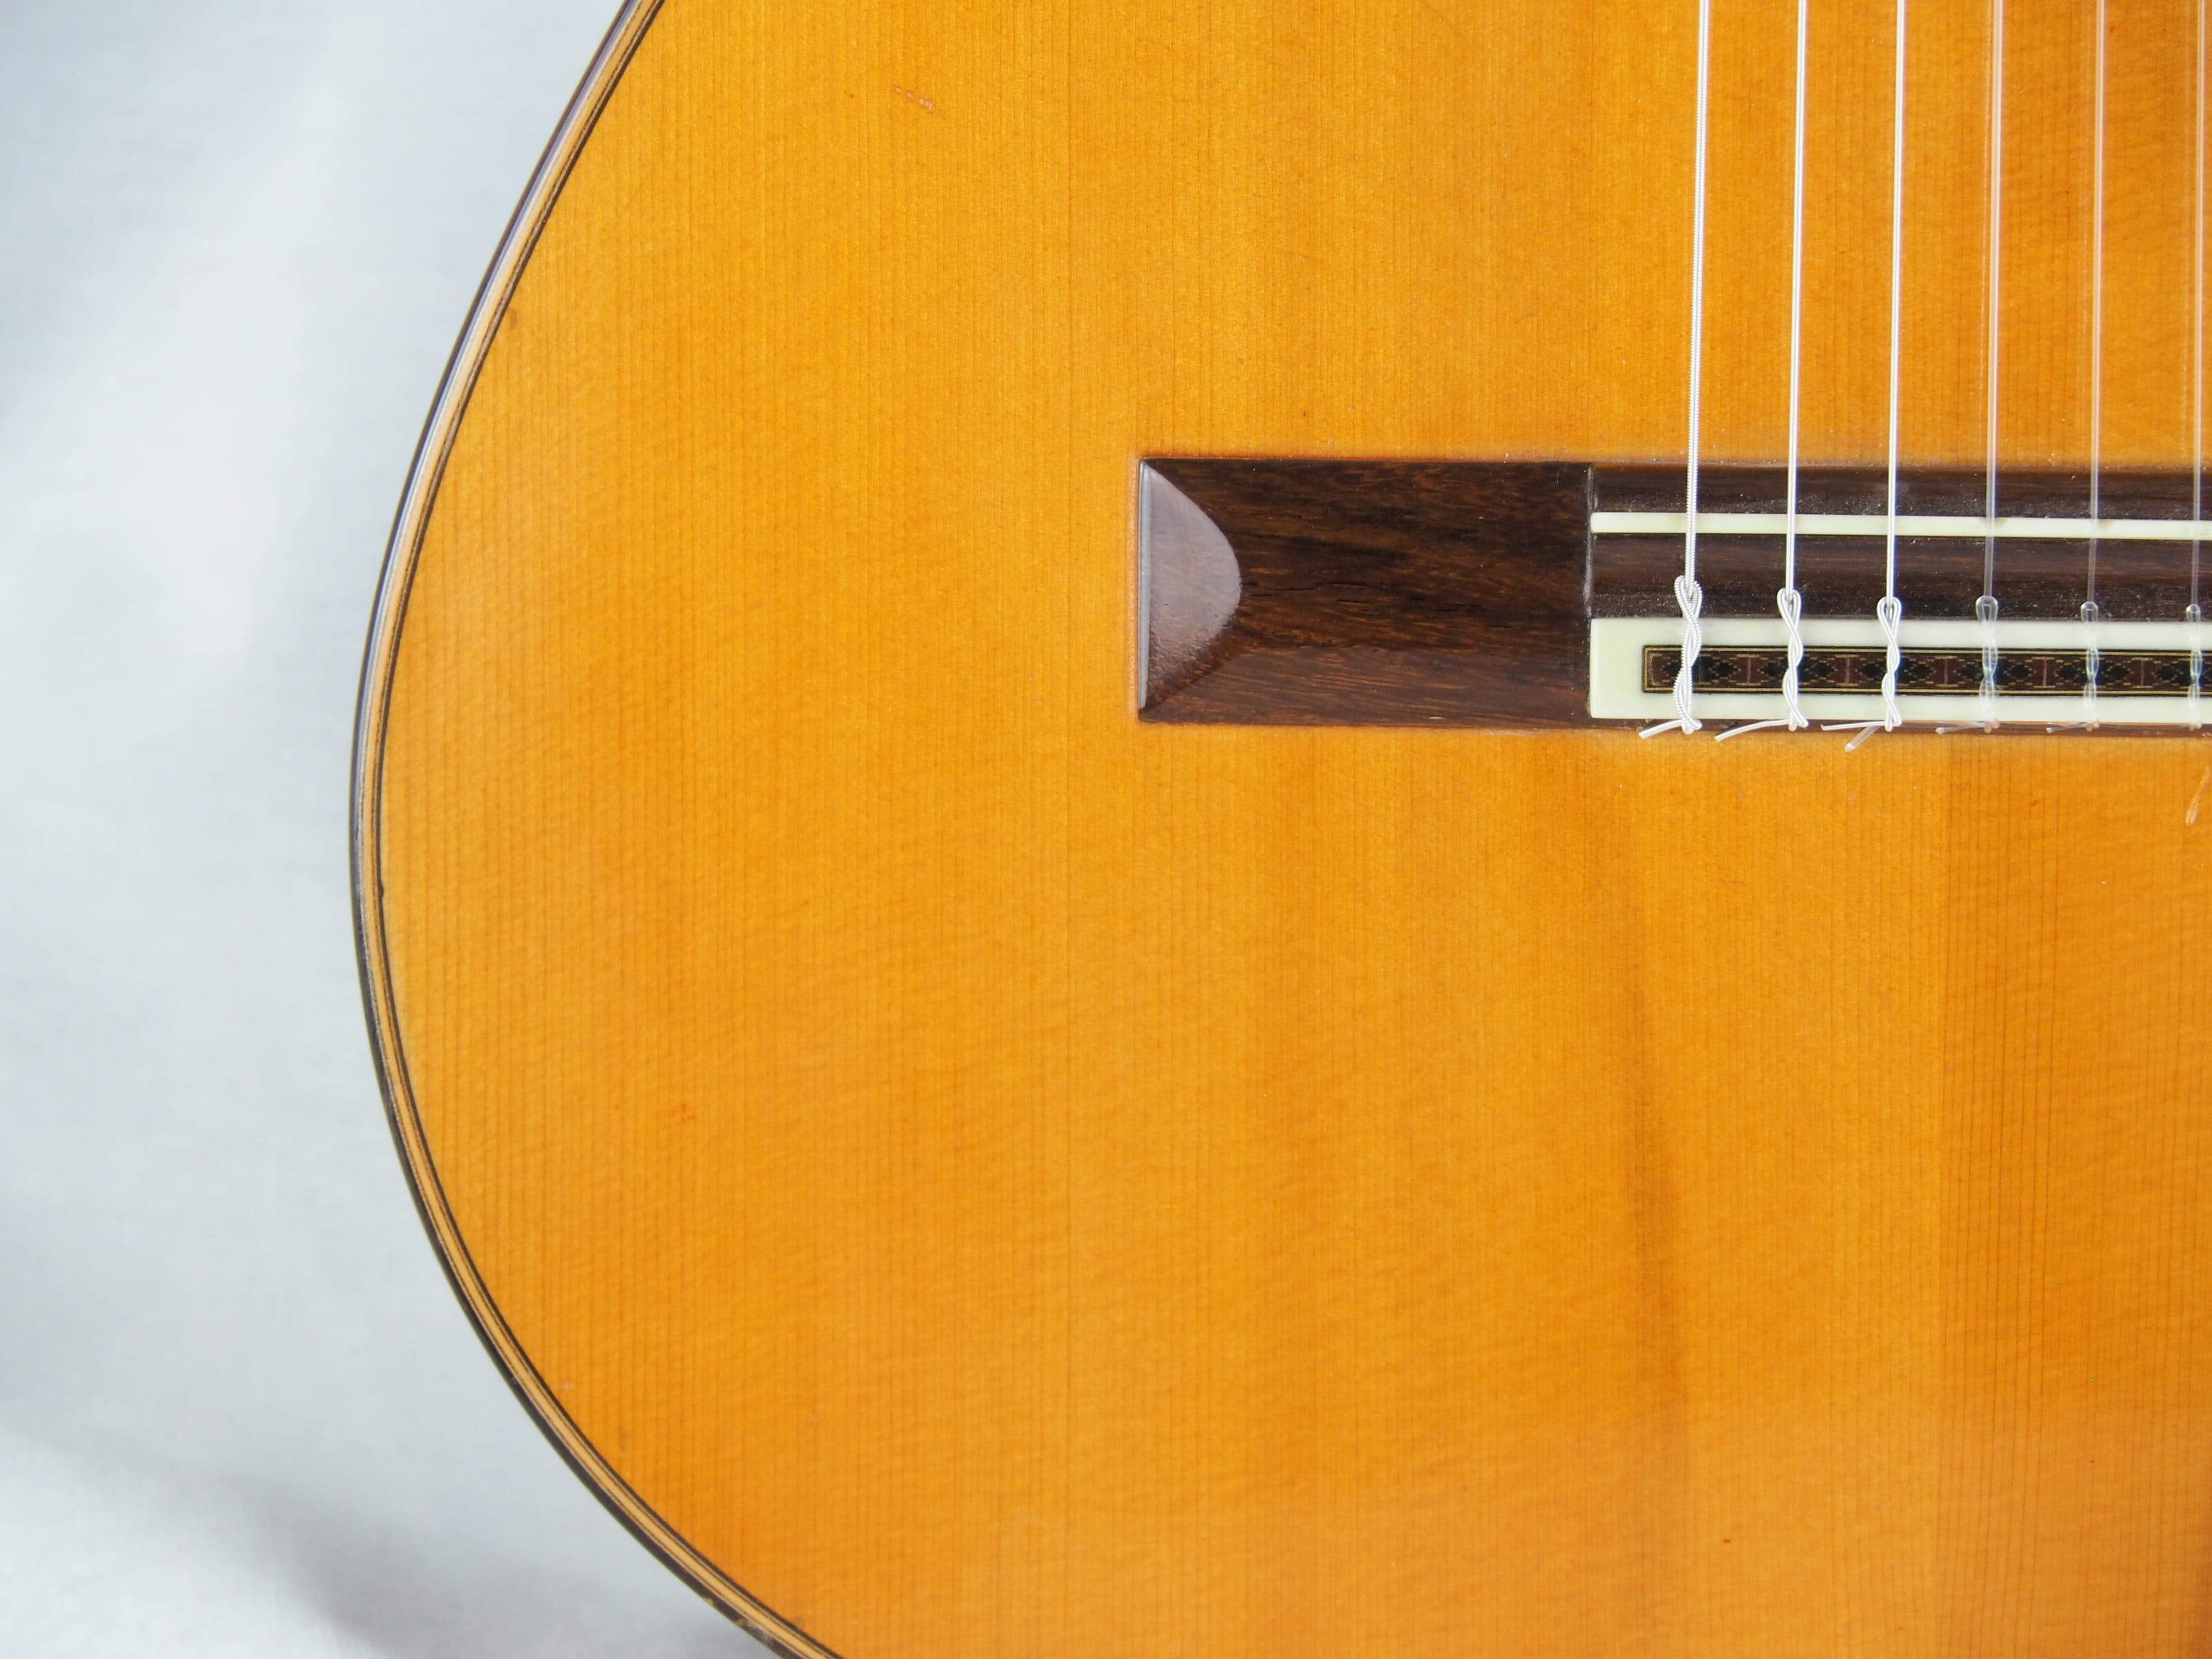 Daniel Friederich luthier guitare classique No 19FRI354-03